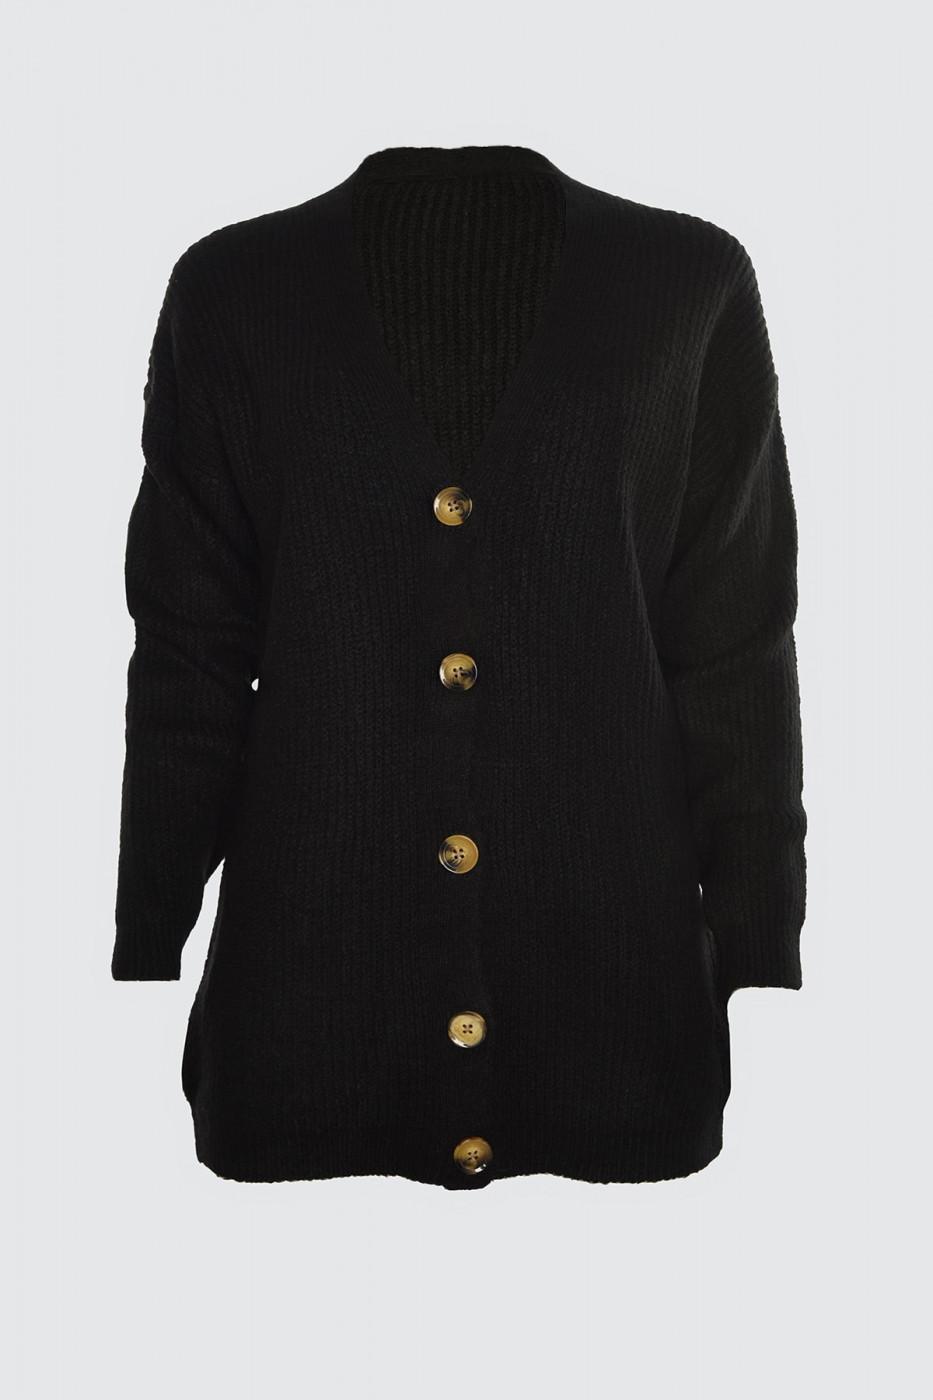 Trendyol Black Knit Cardigan